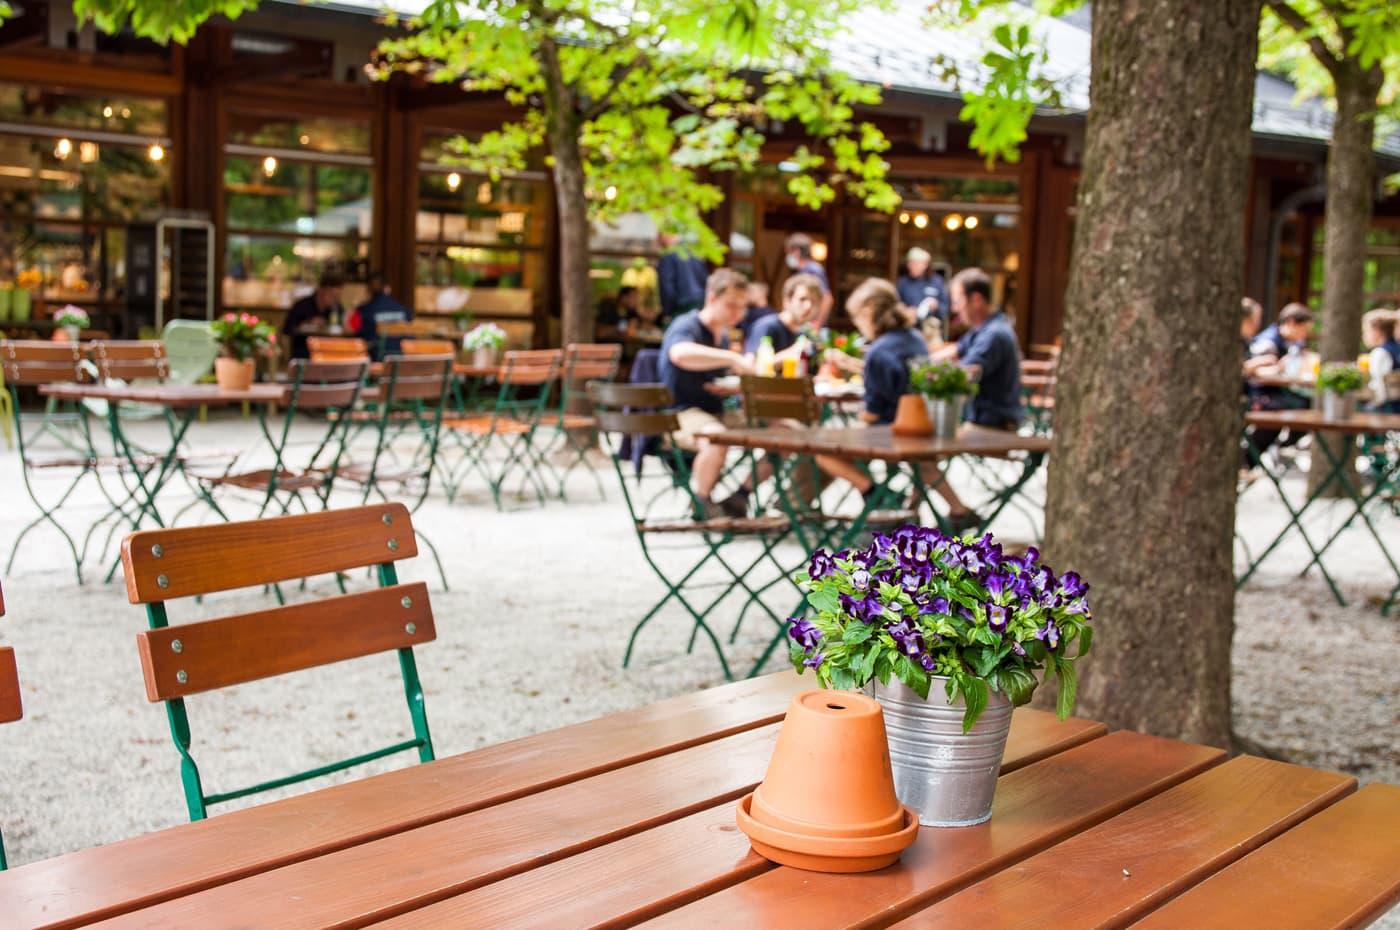 Biergarten im Tierparkrestaurant Hellabrunn in München // HIMBEER